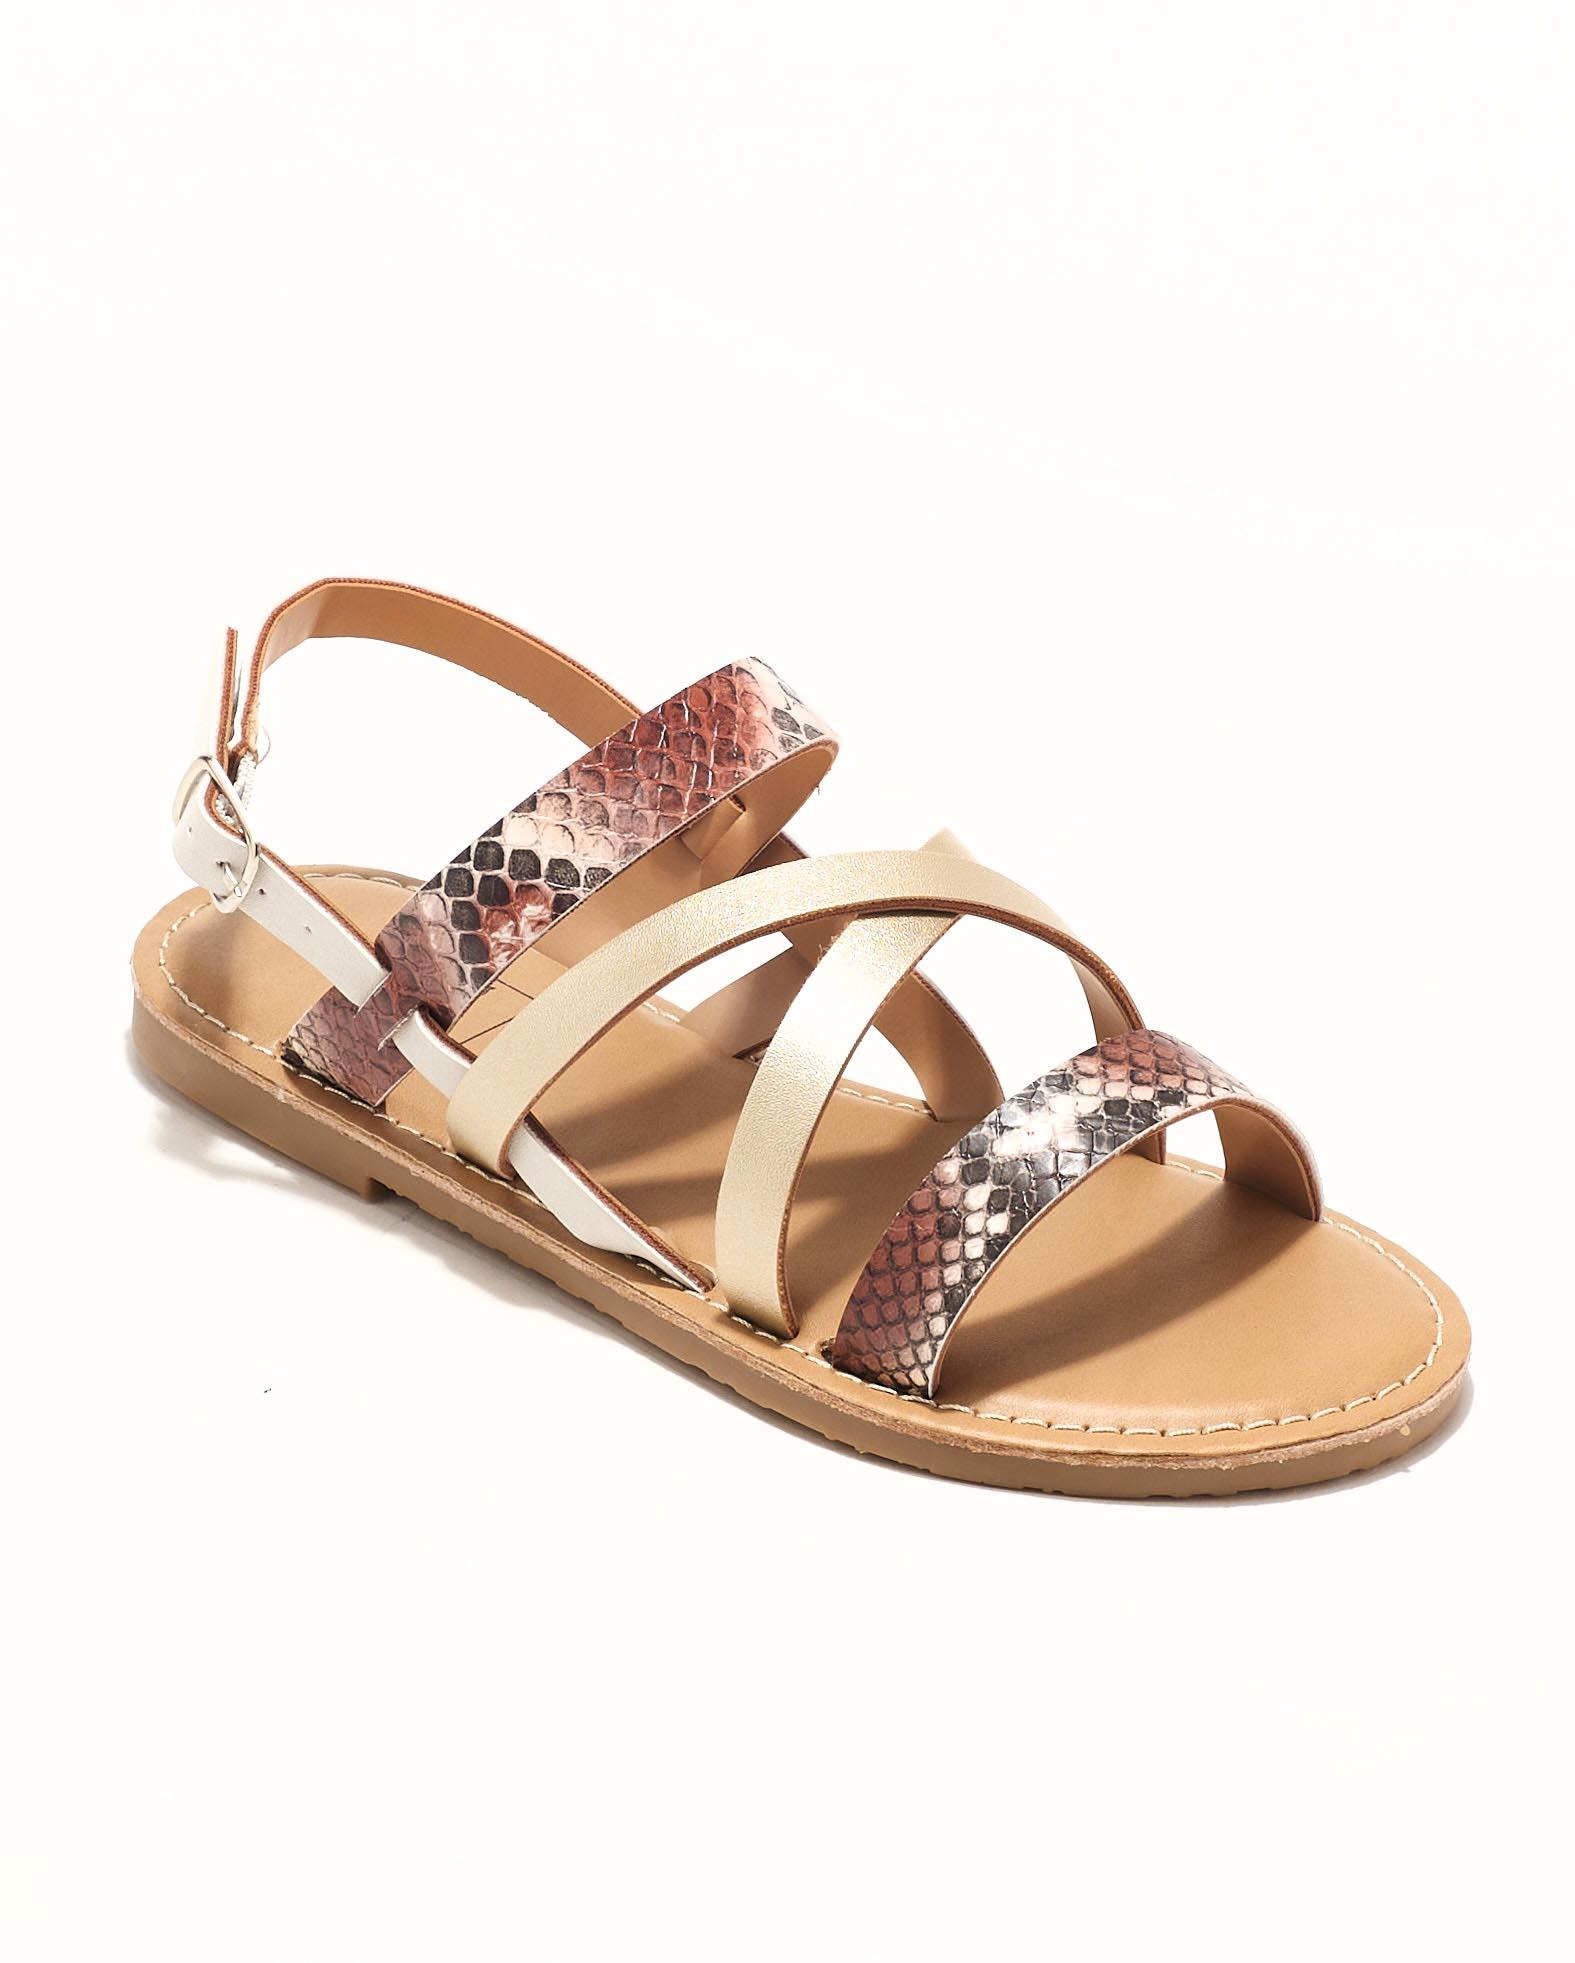 Sandales Fille - Sandale Ouverte Python Marron Jina - Ydxls23j-2 Jf